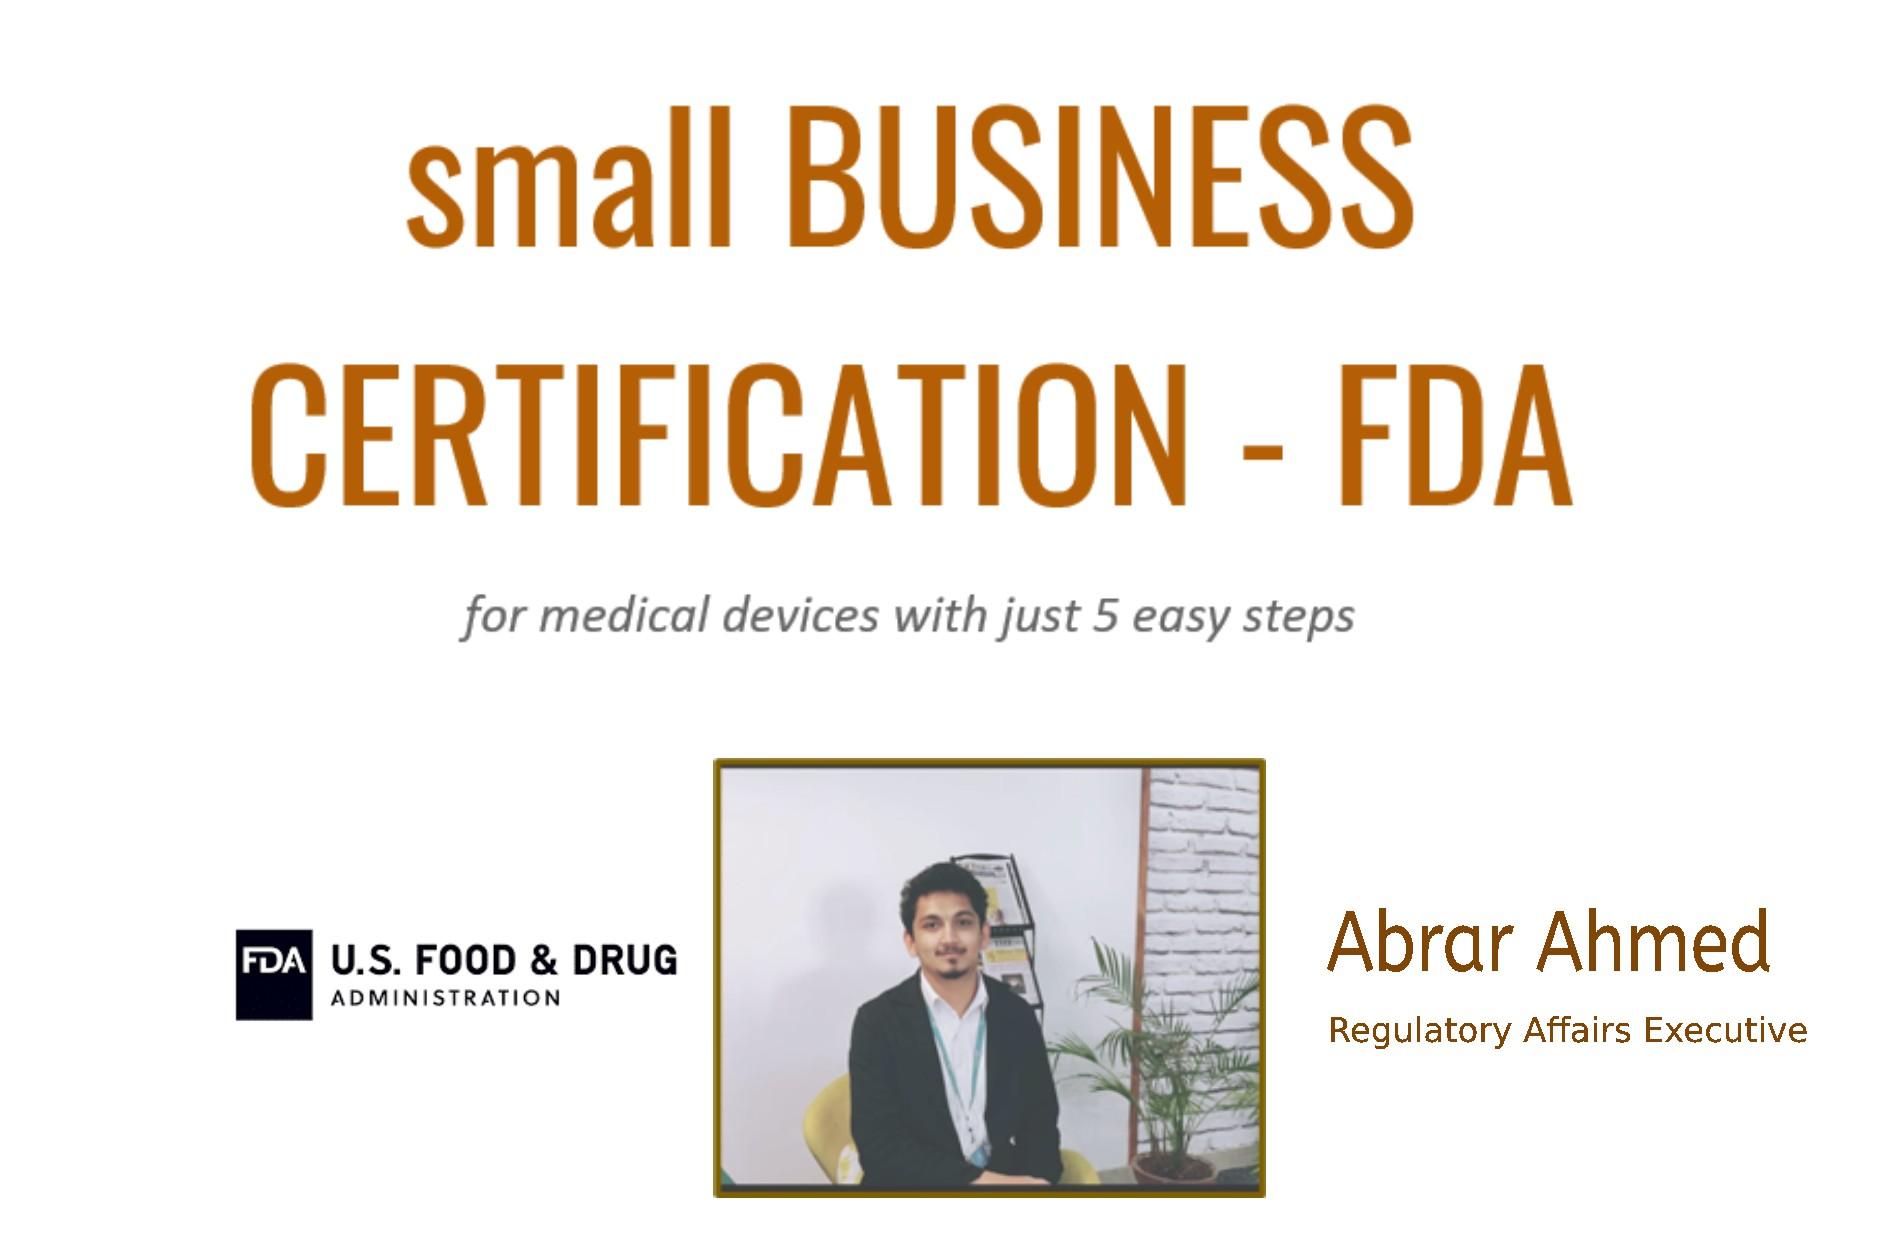 Small Business Certification – FDA